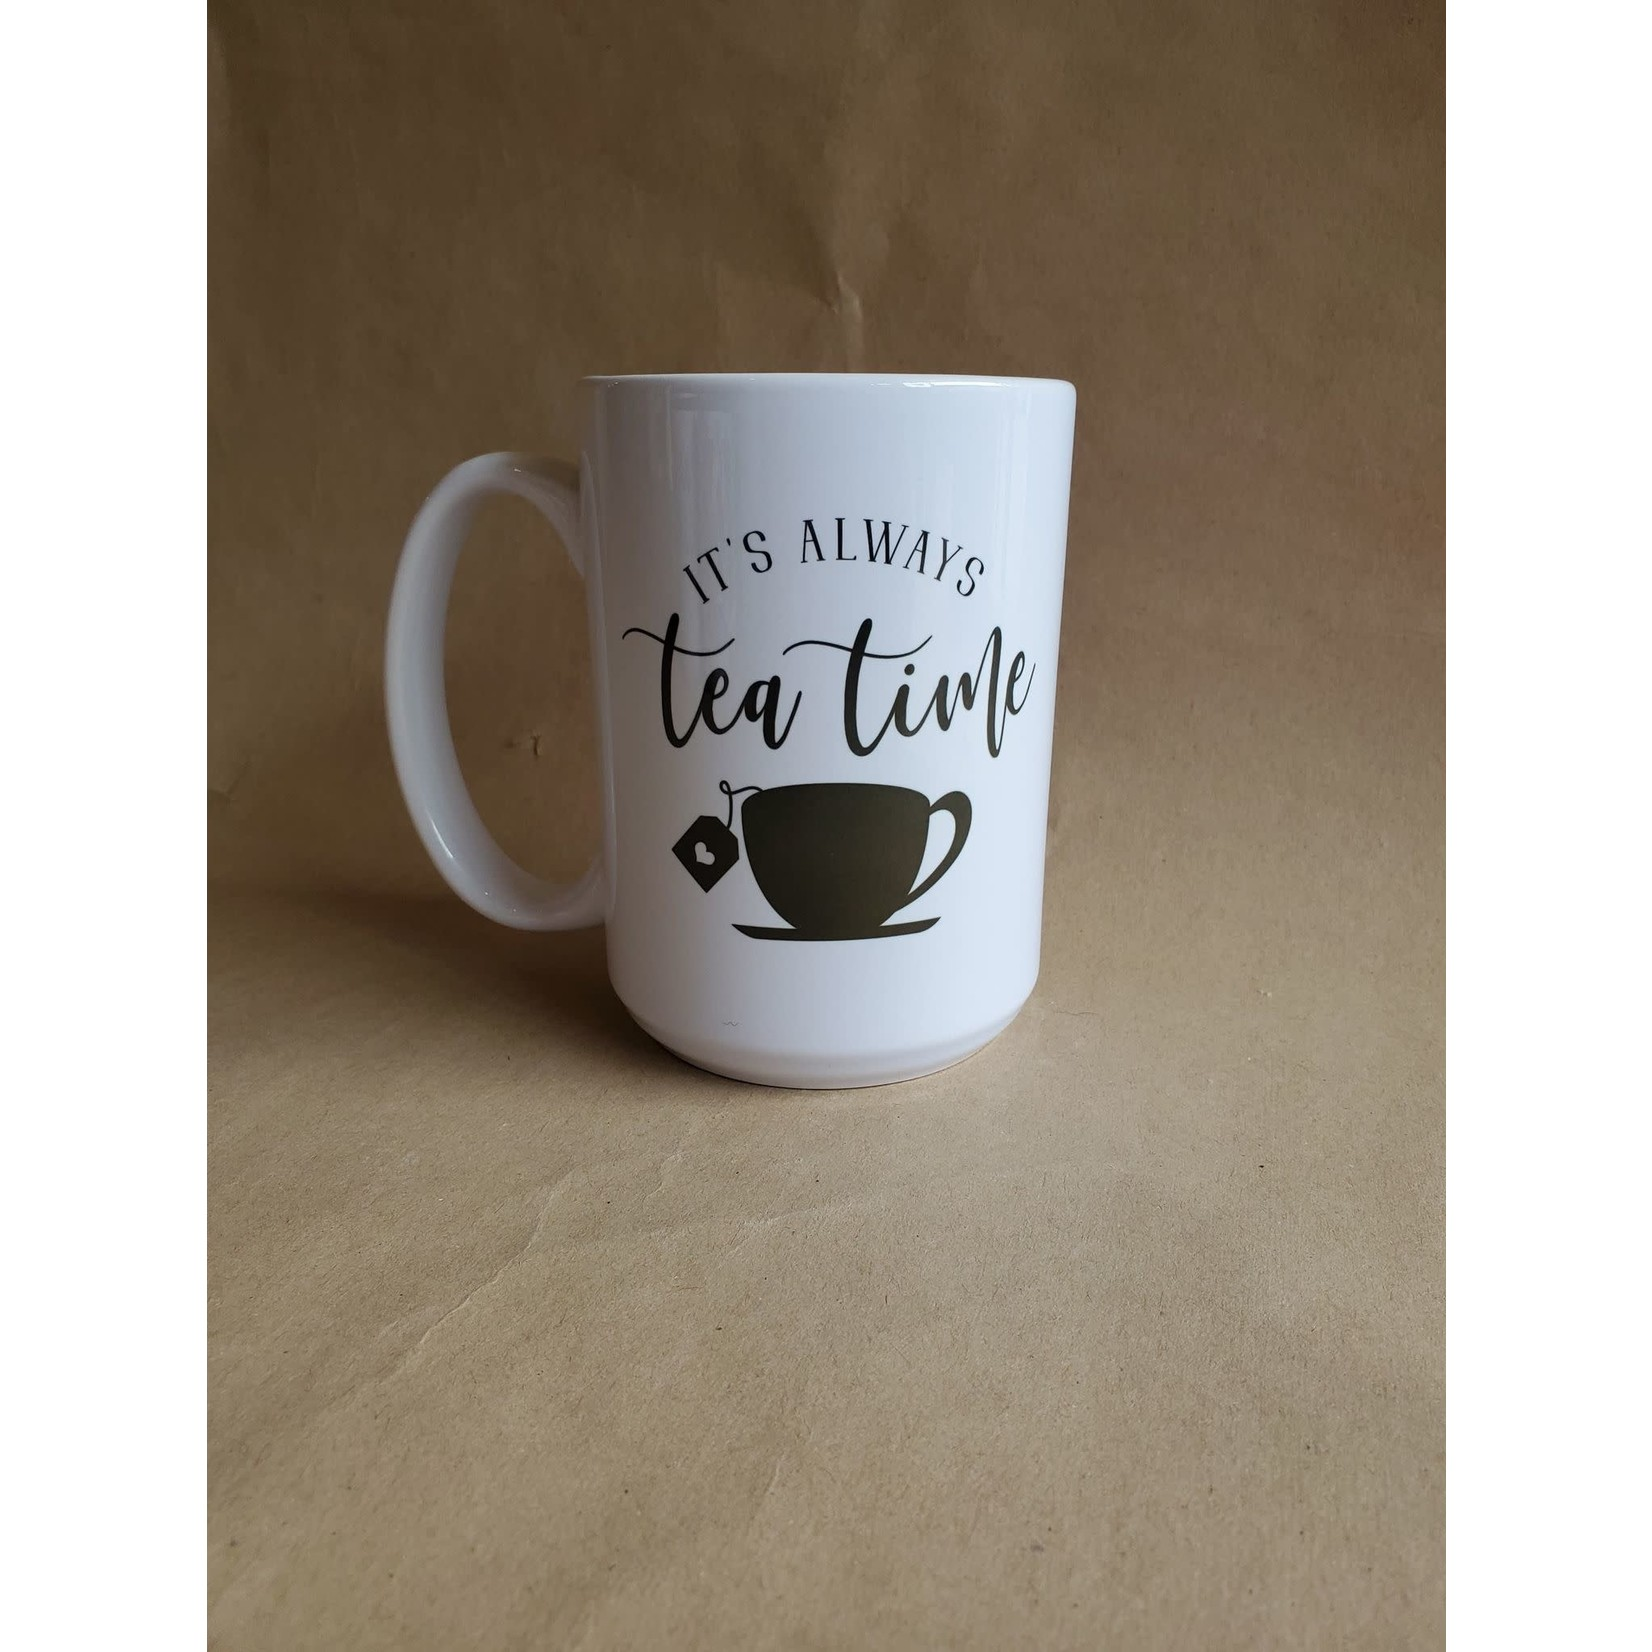 favourite things apparel It's always tea time mug